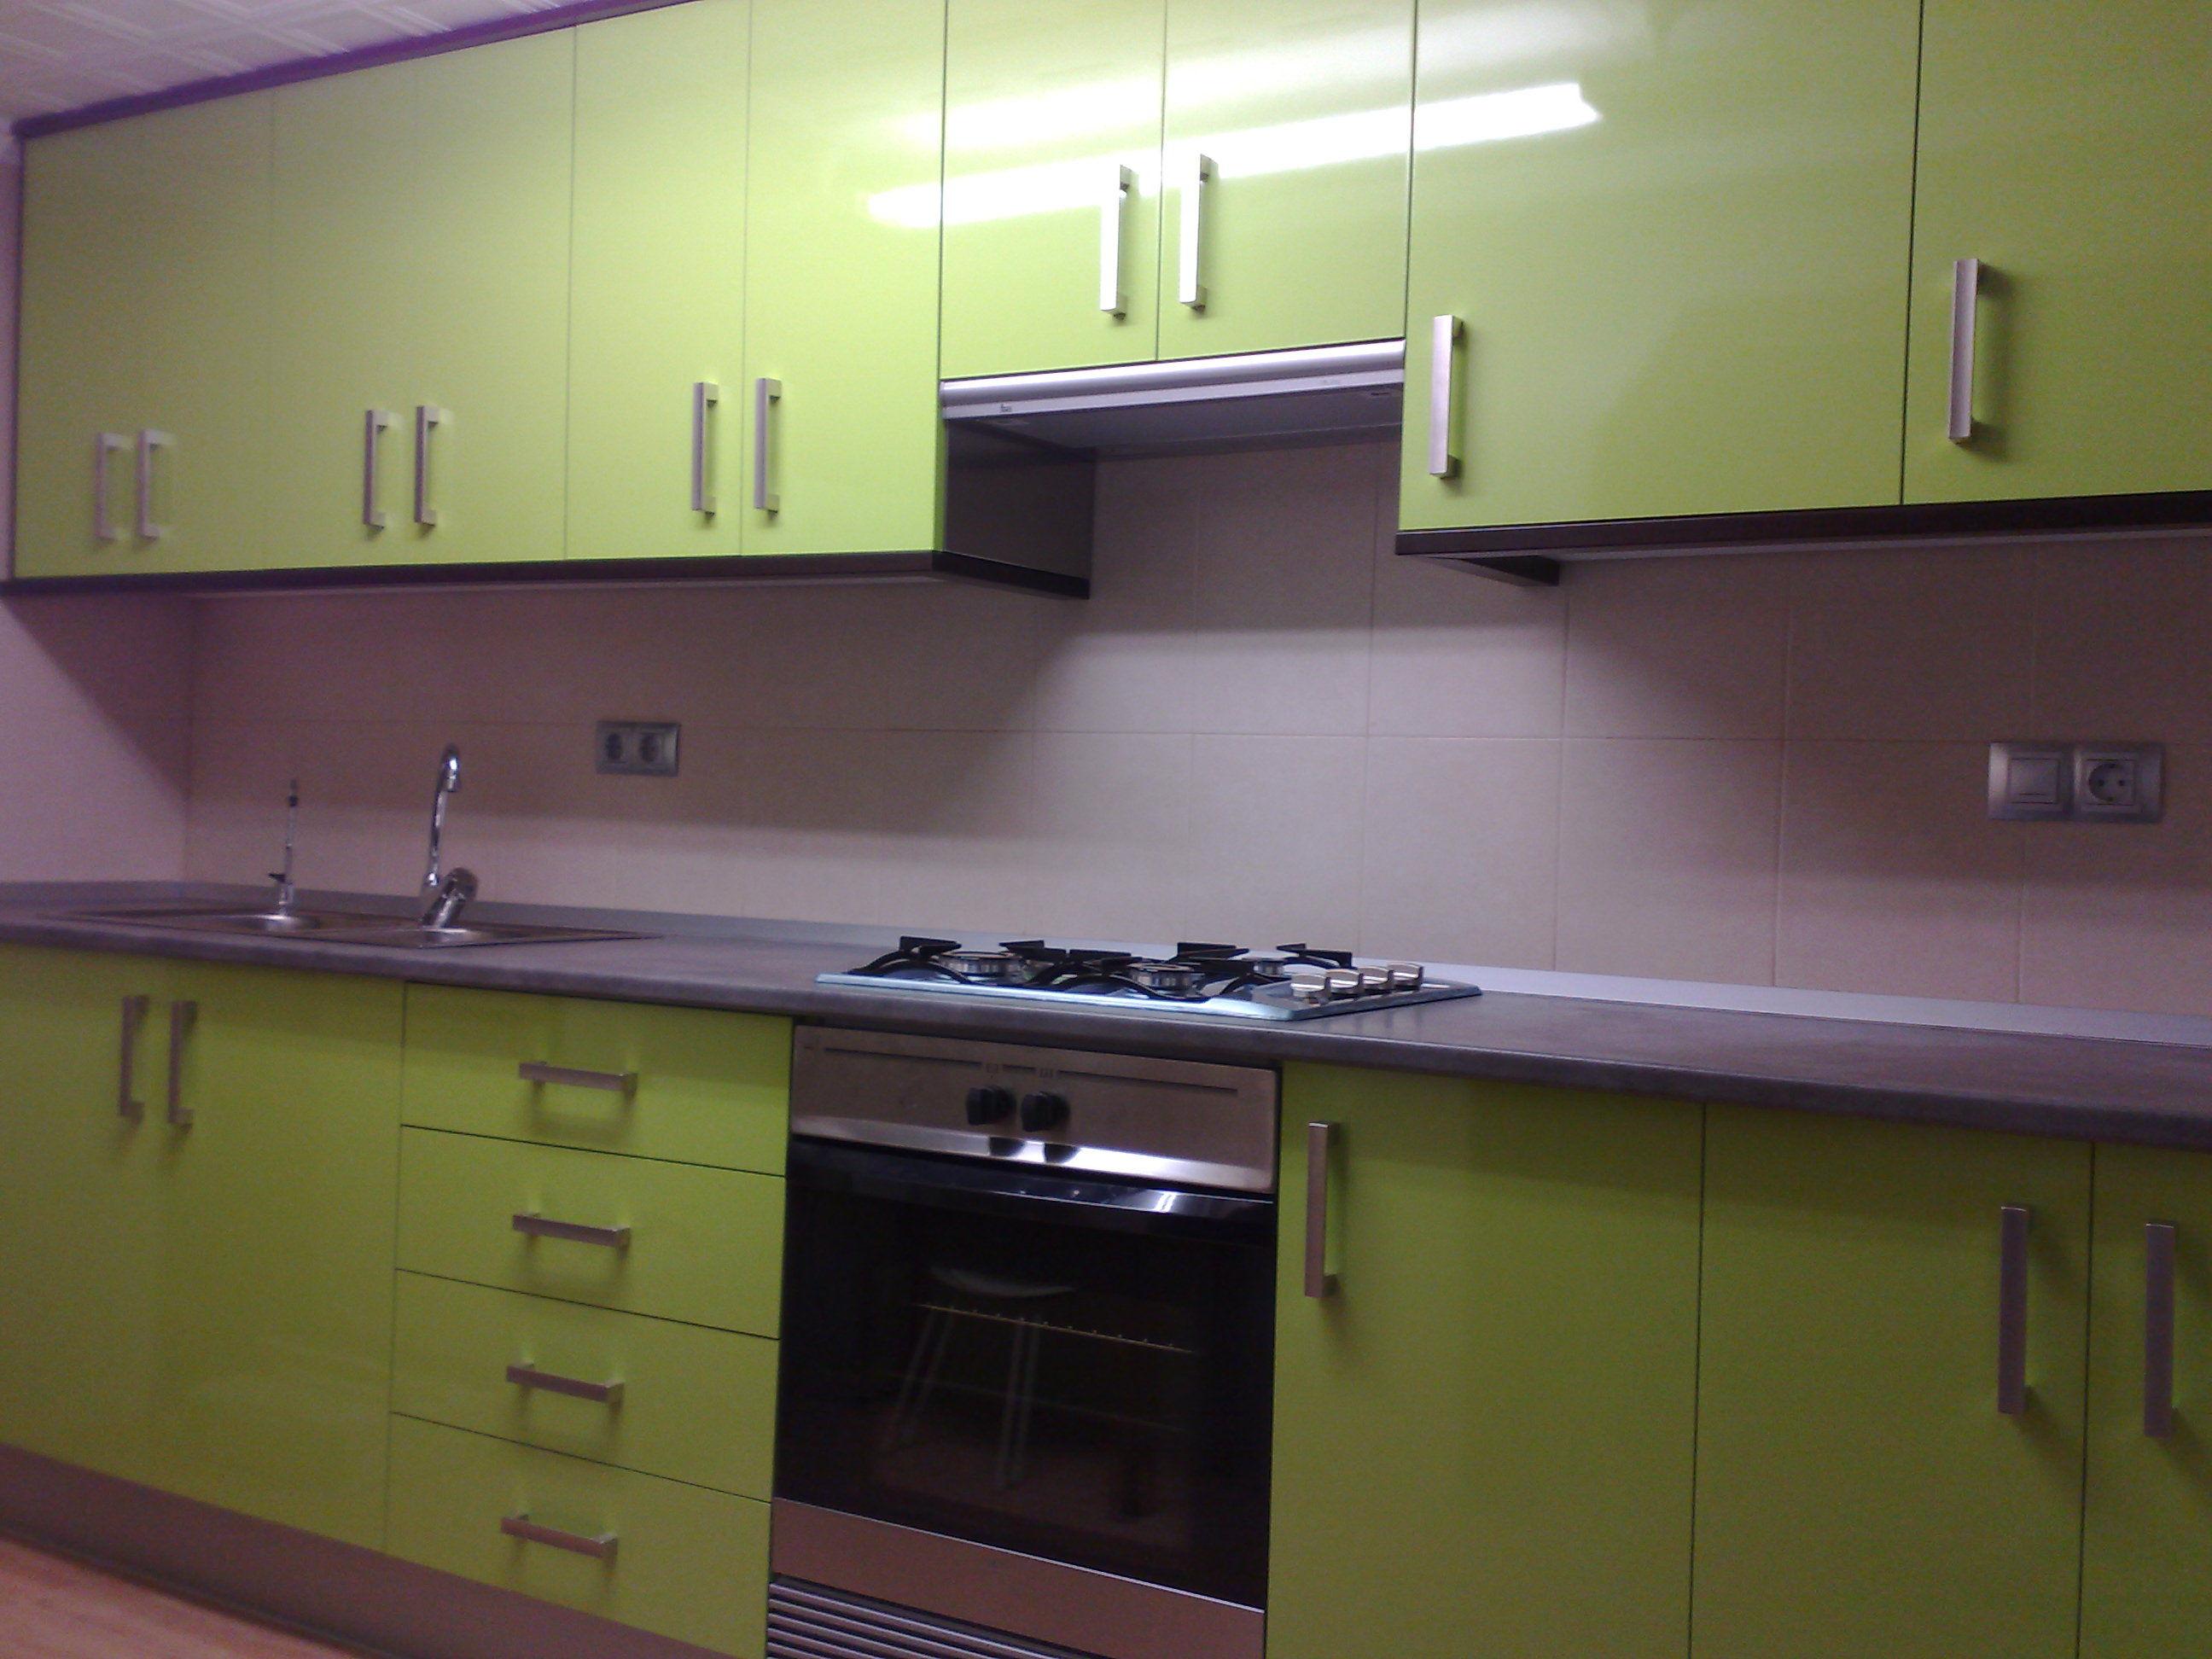 Muebles cocina verde pistacho ideas for Cocina verde pistacho